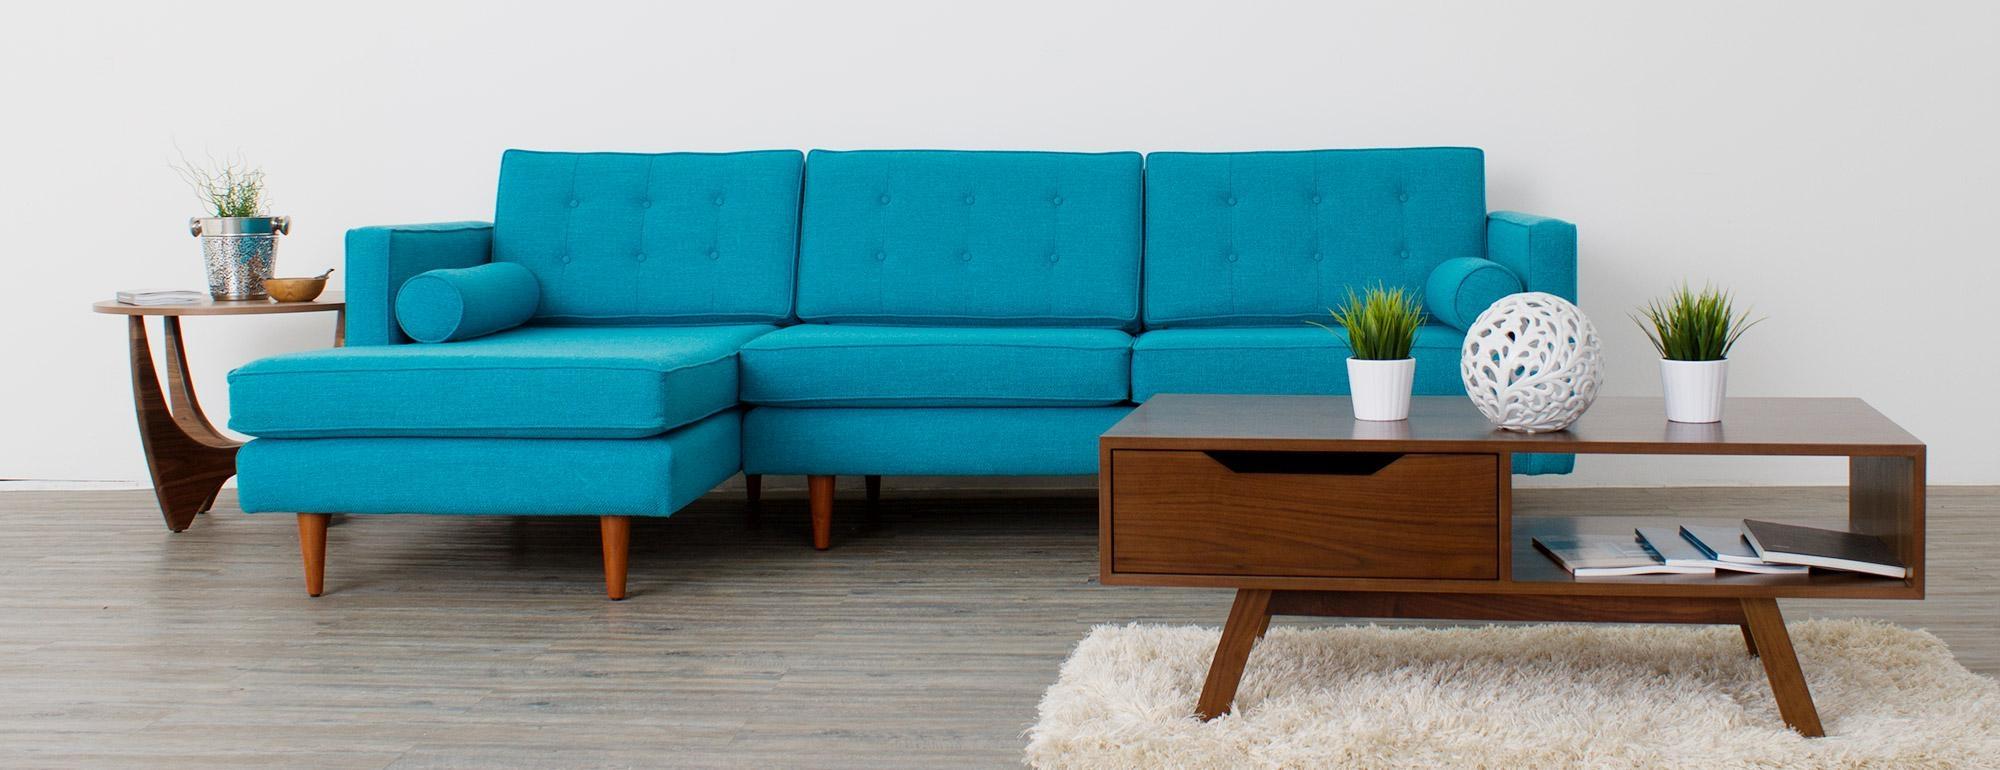 Braxton Sectional | Joybird With Regard To Braxton Sectional Sofa (View 2 of 15)